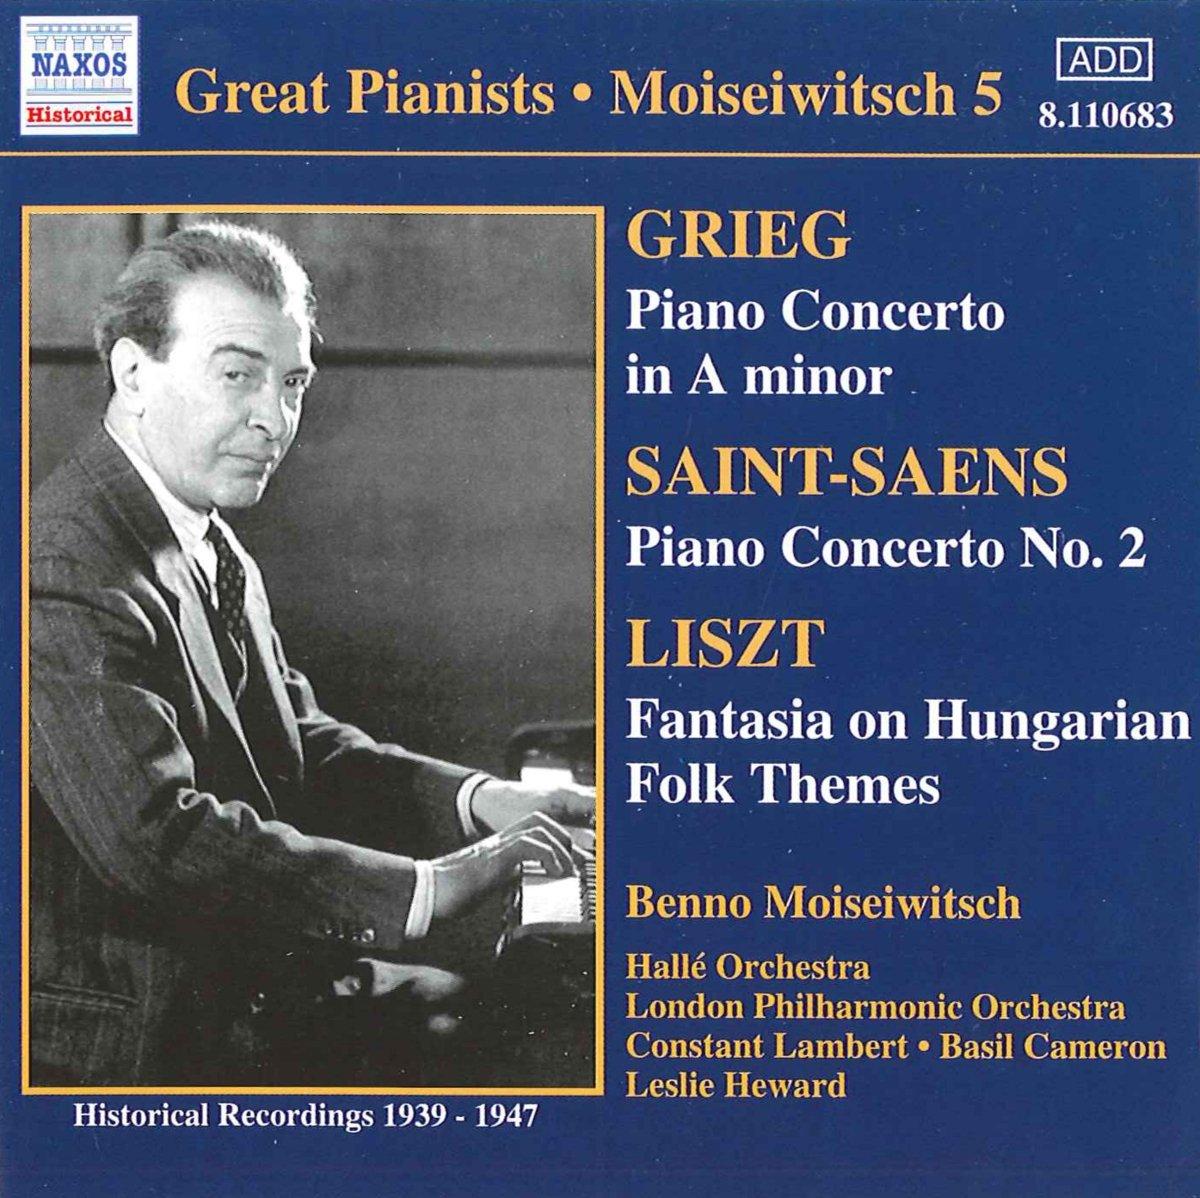 Grieg, Saint-Saens, Liszt, Benno Moiseiwitsch Great Pianists - Moiseiwitsch 5